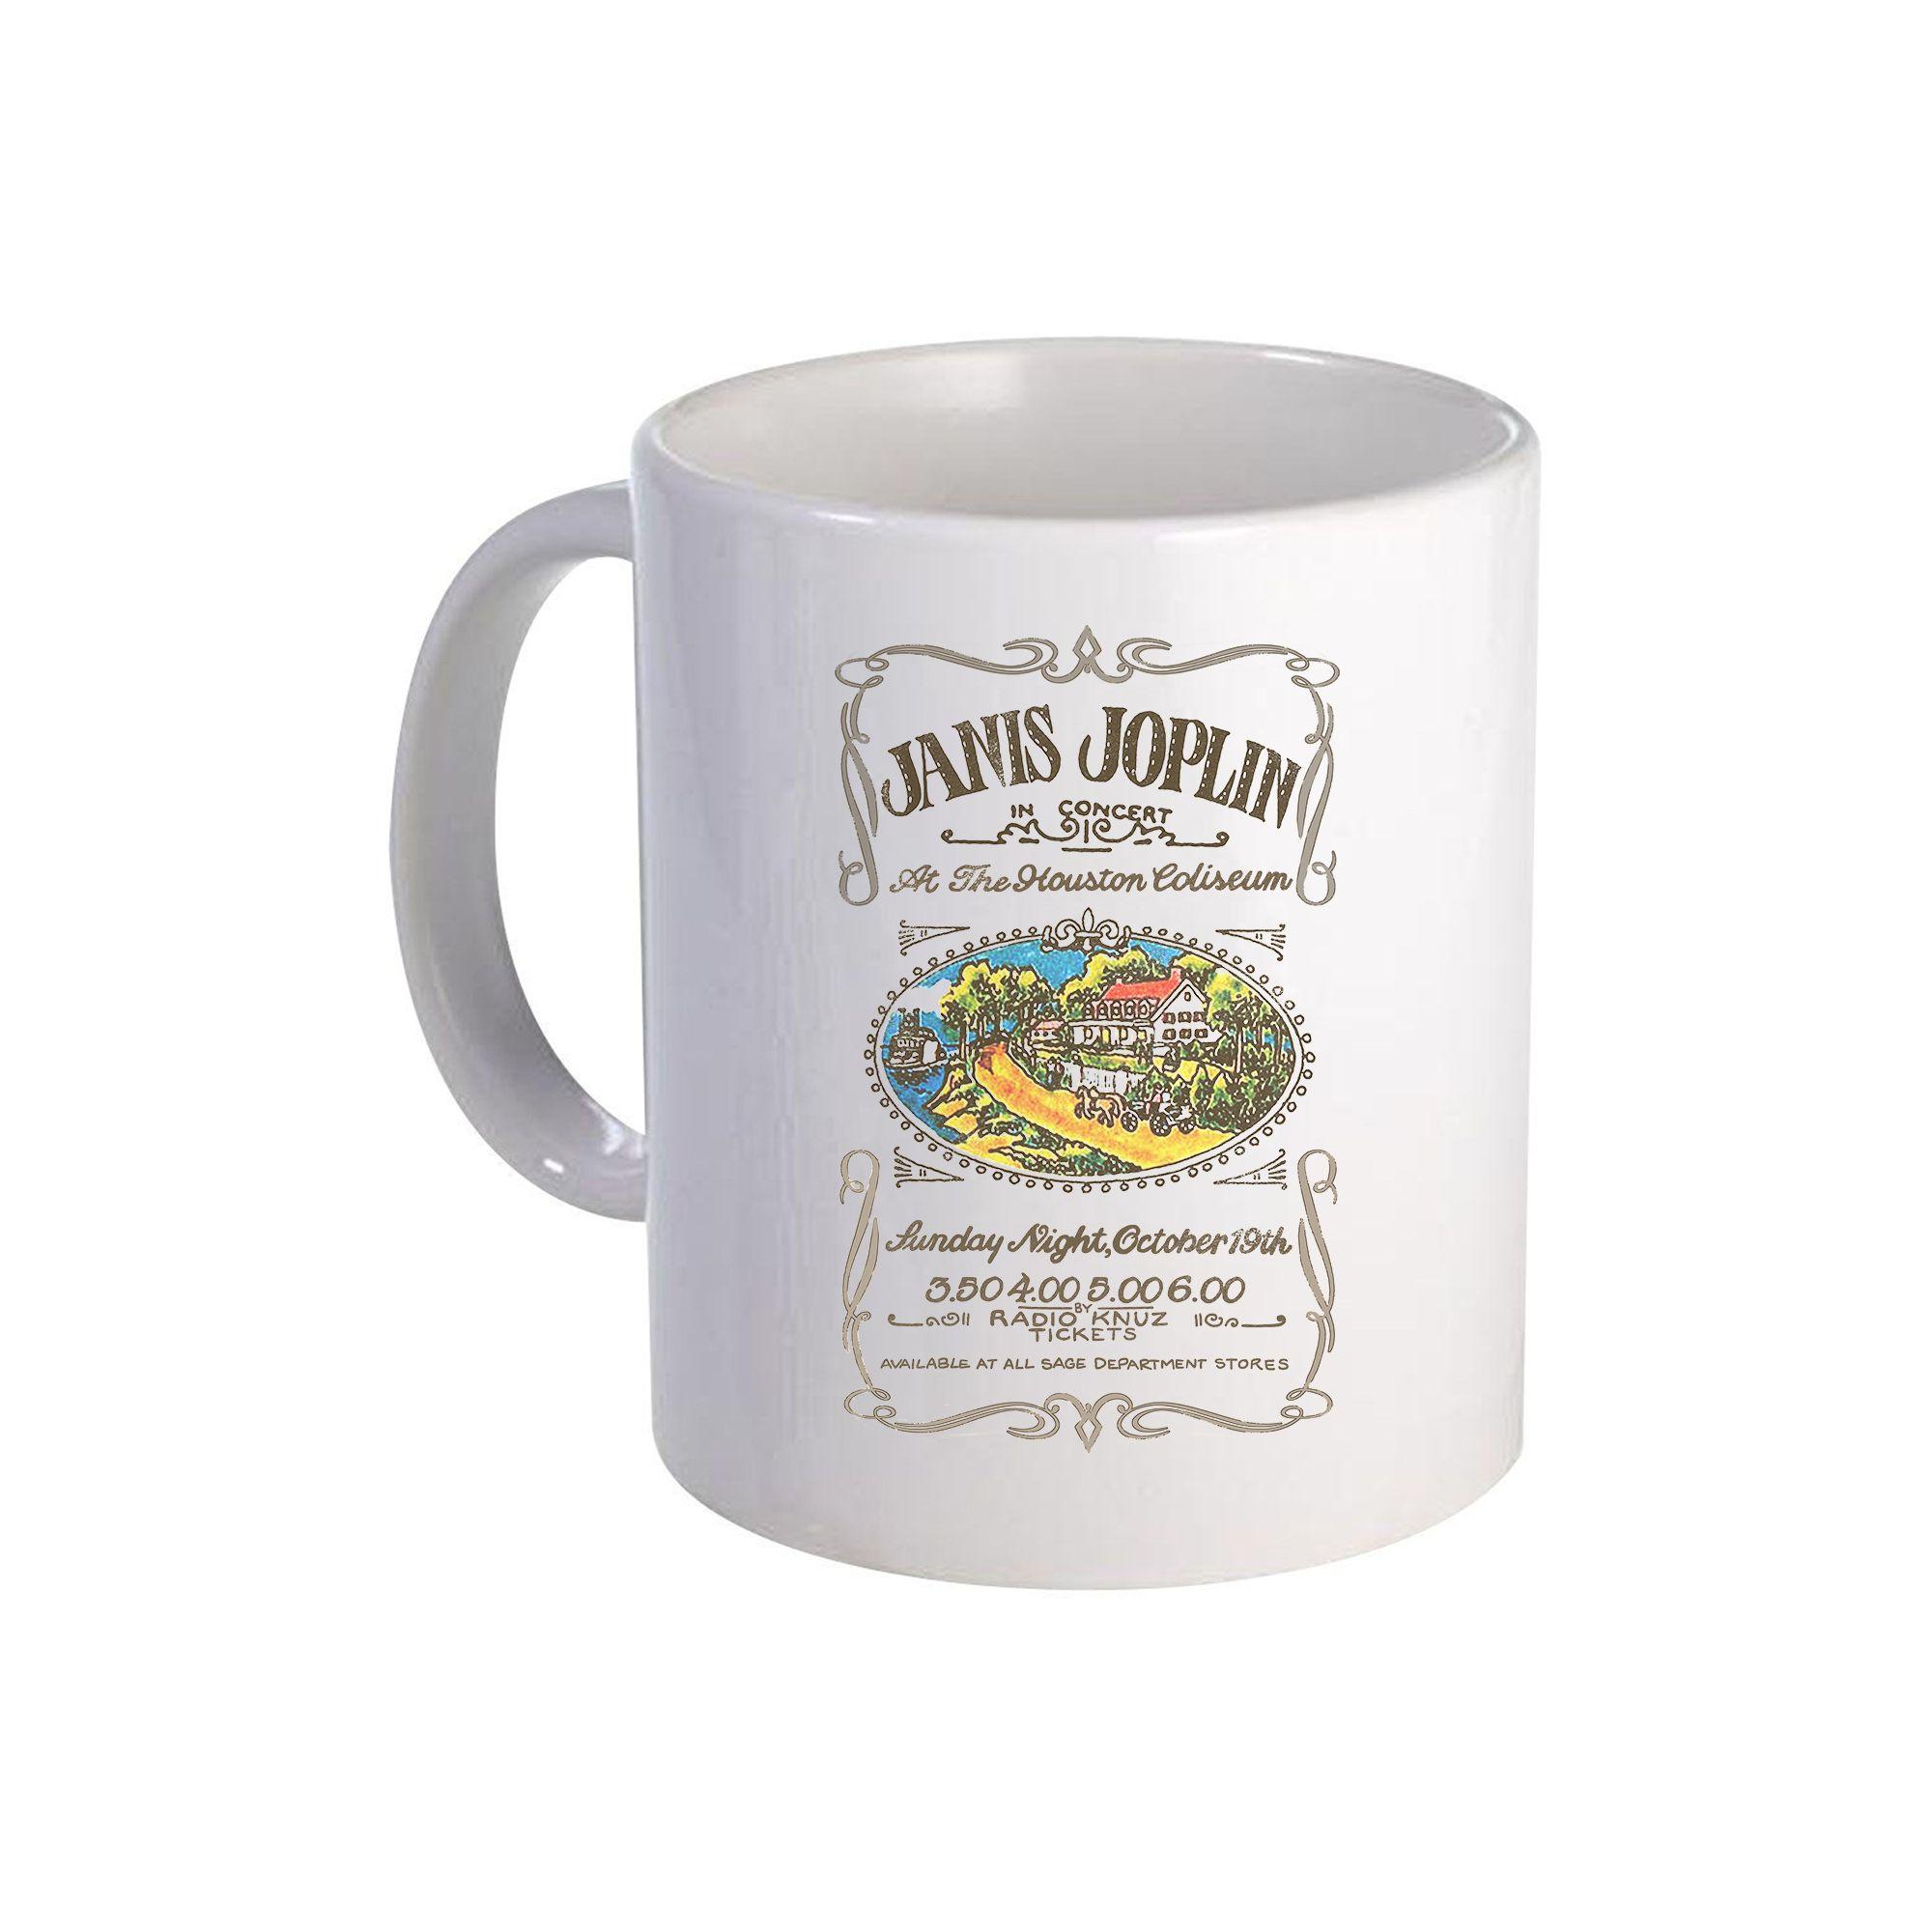 Houston Coliseum Ceramic Mug